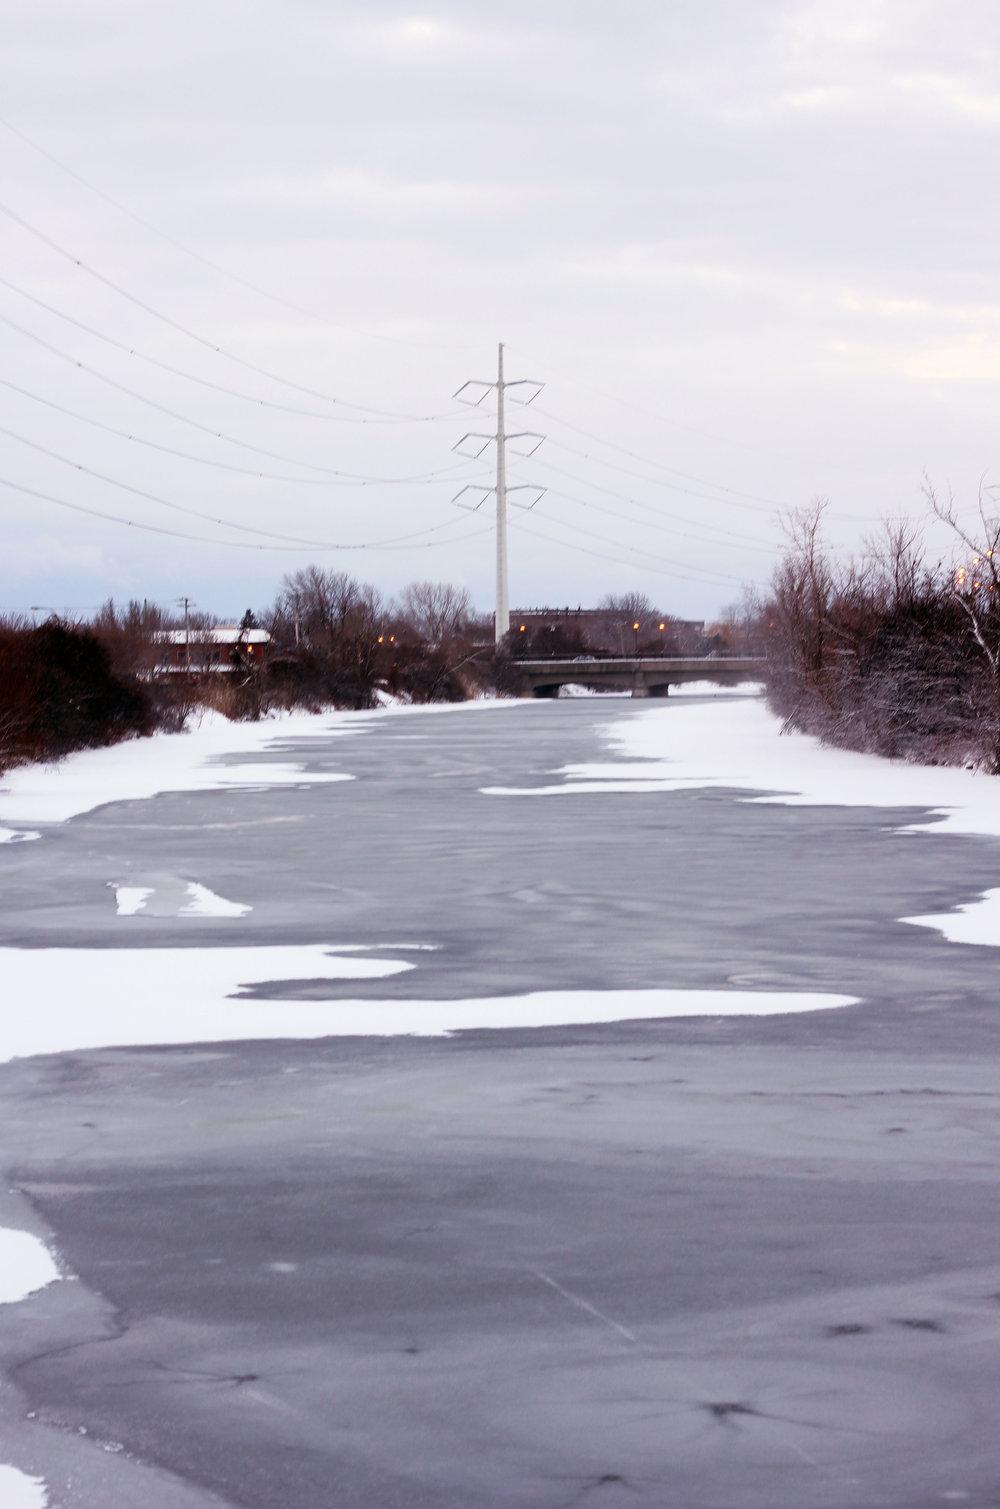 Frozen Montreal river